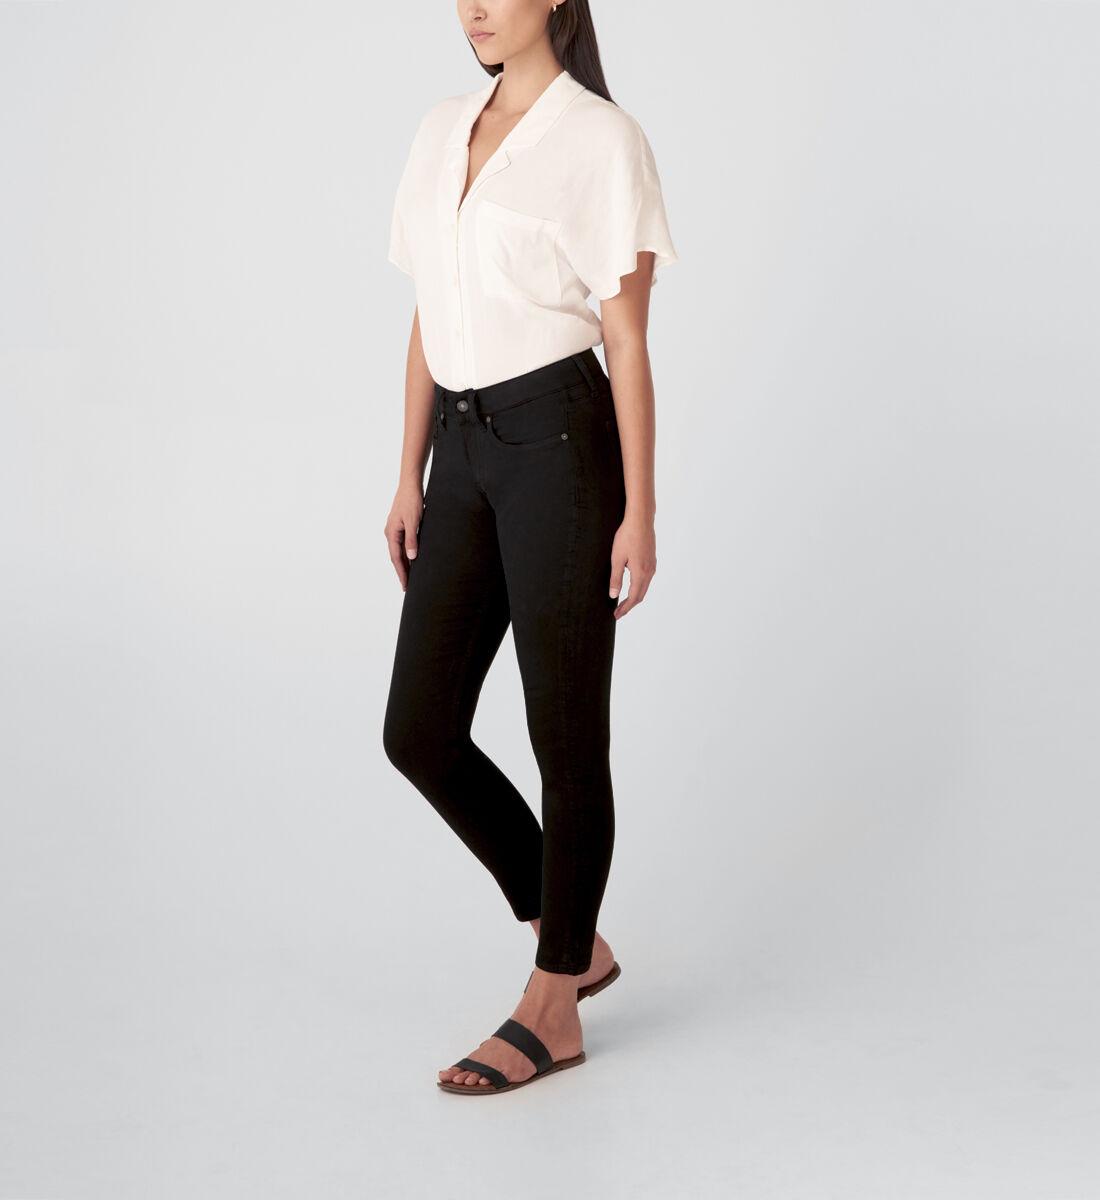 Suki Mid Rise Skinny Jeans,Black Side